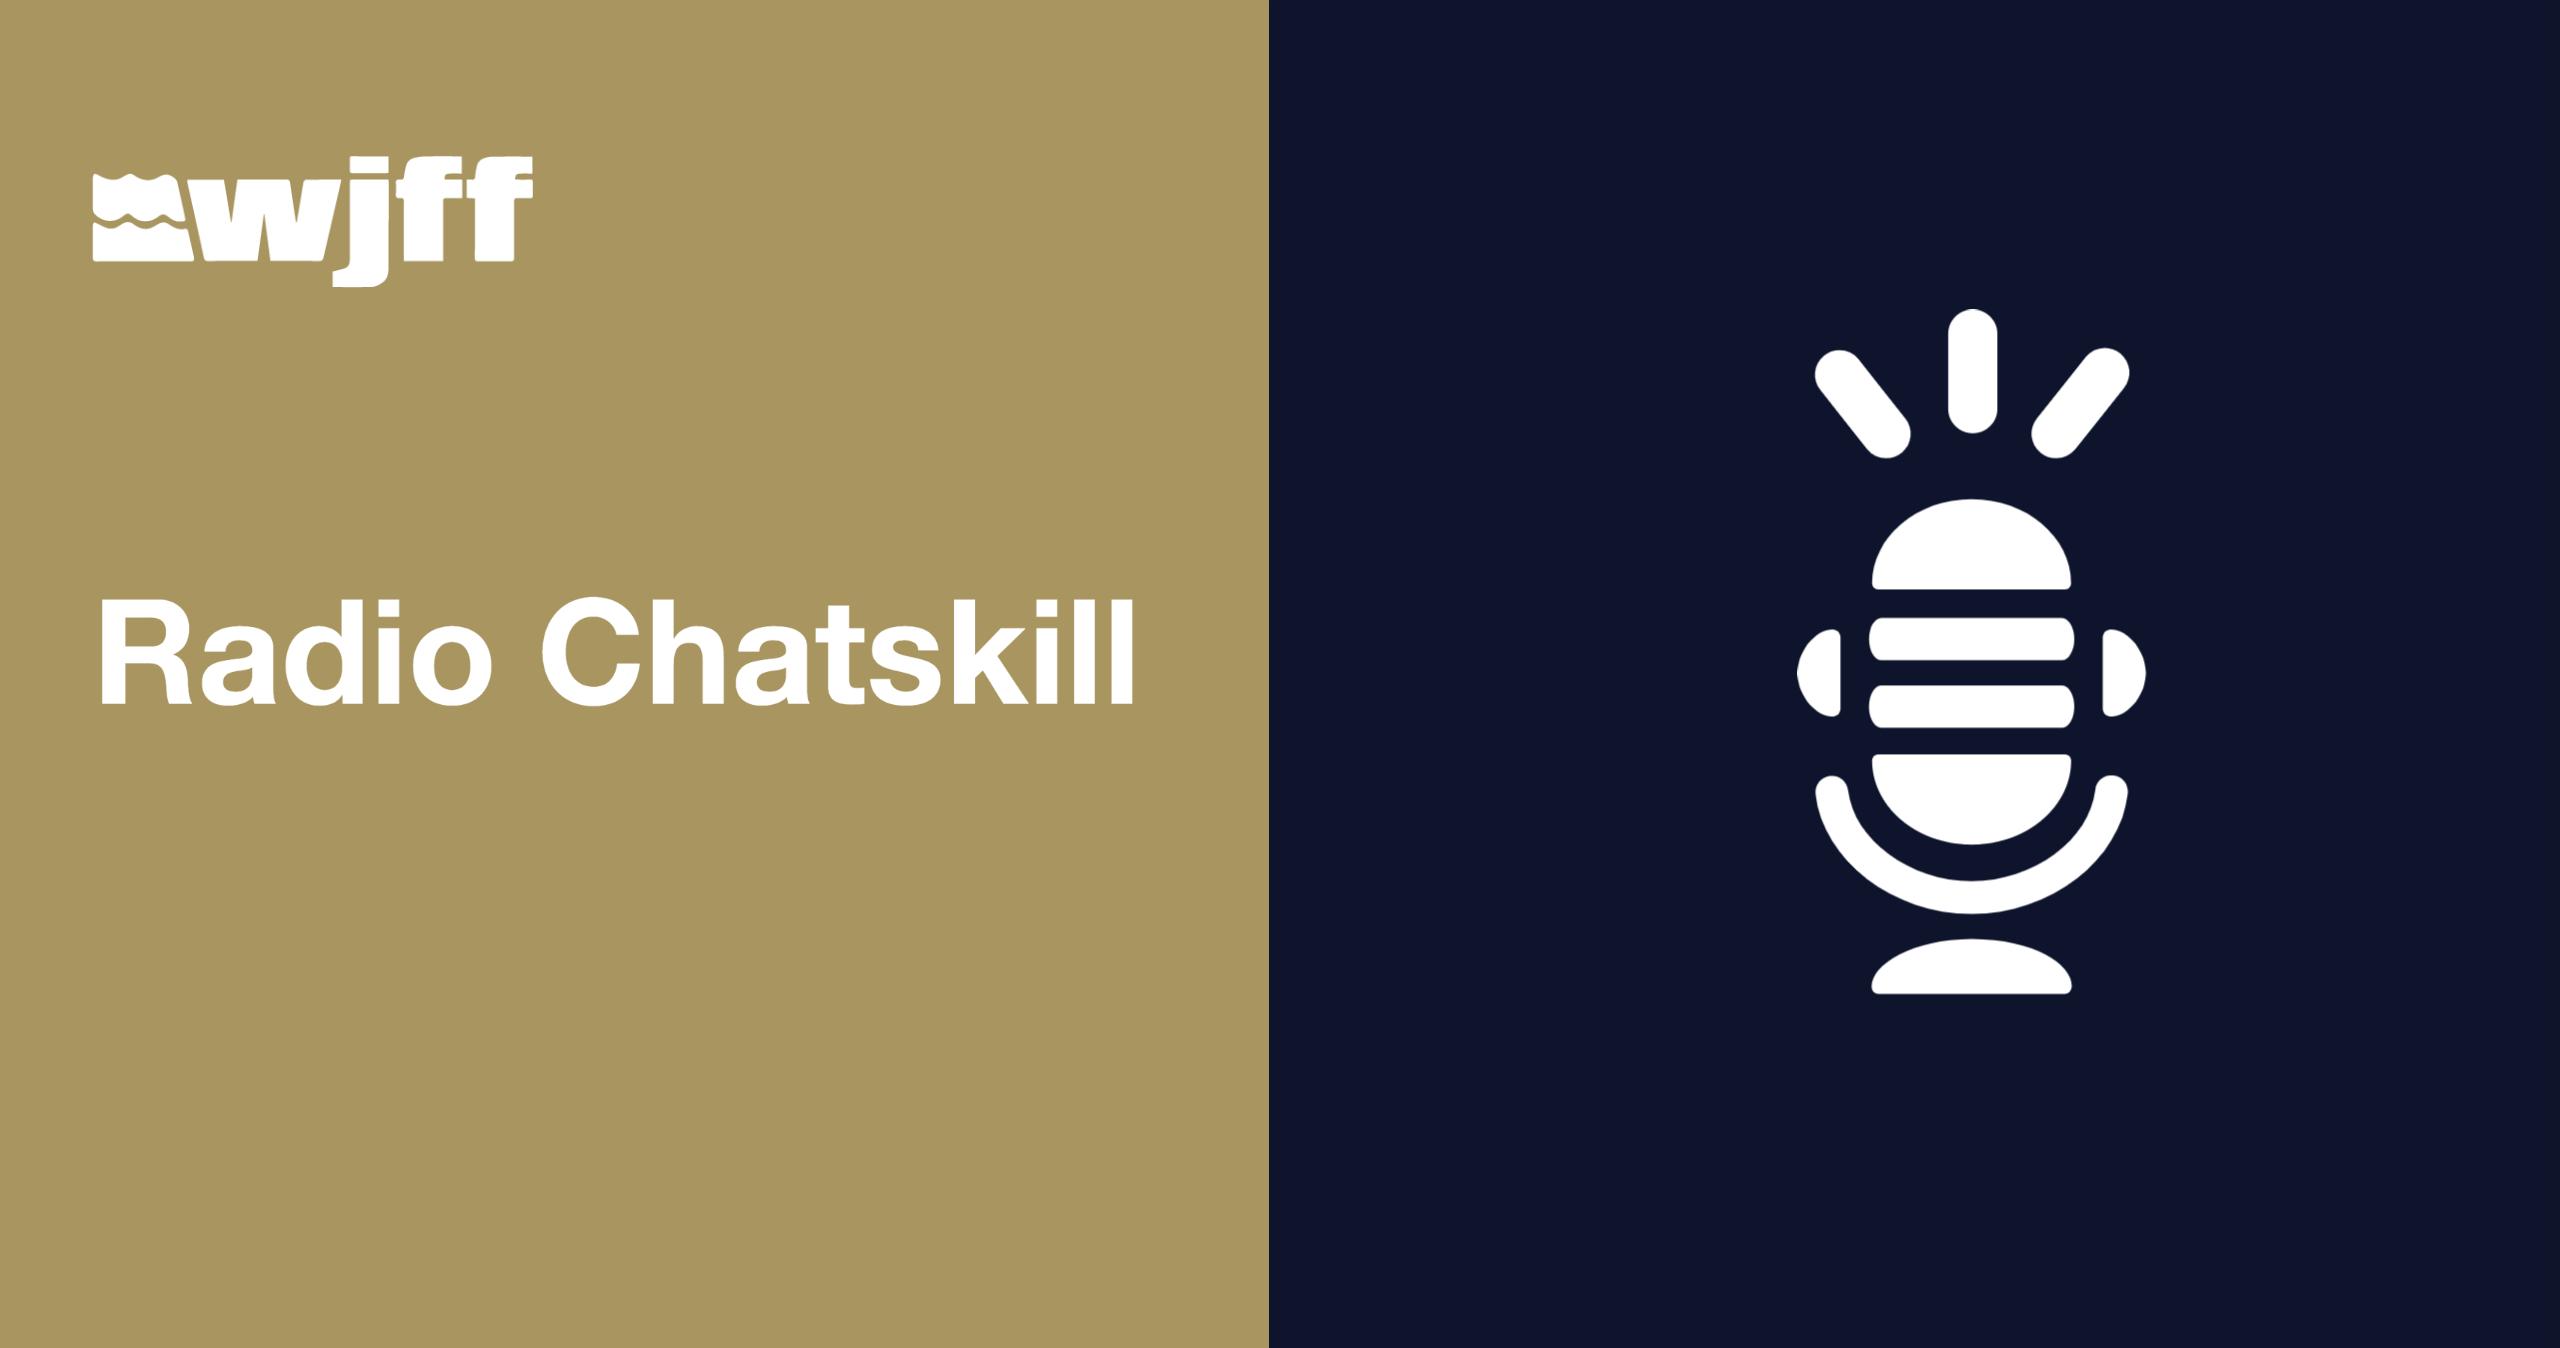 Radio Chatskill